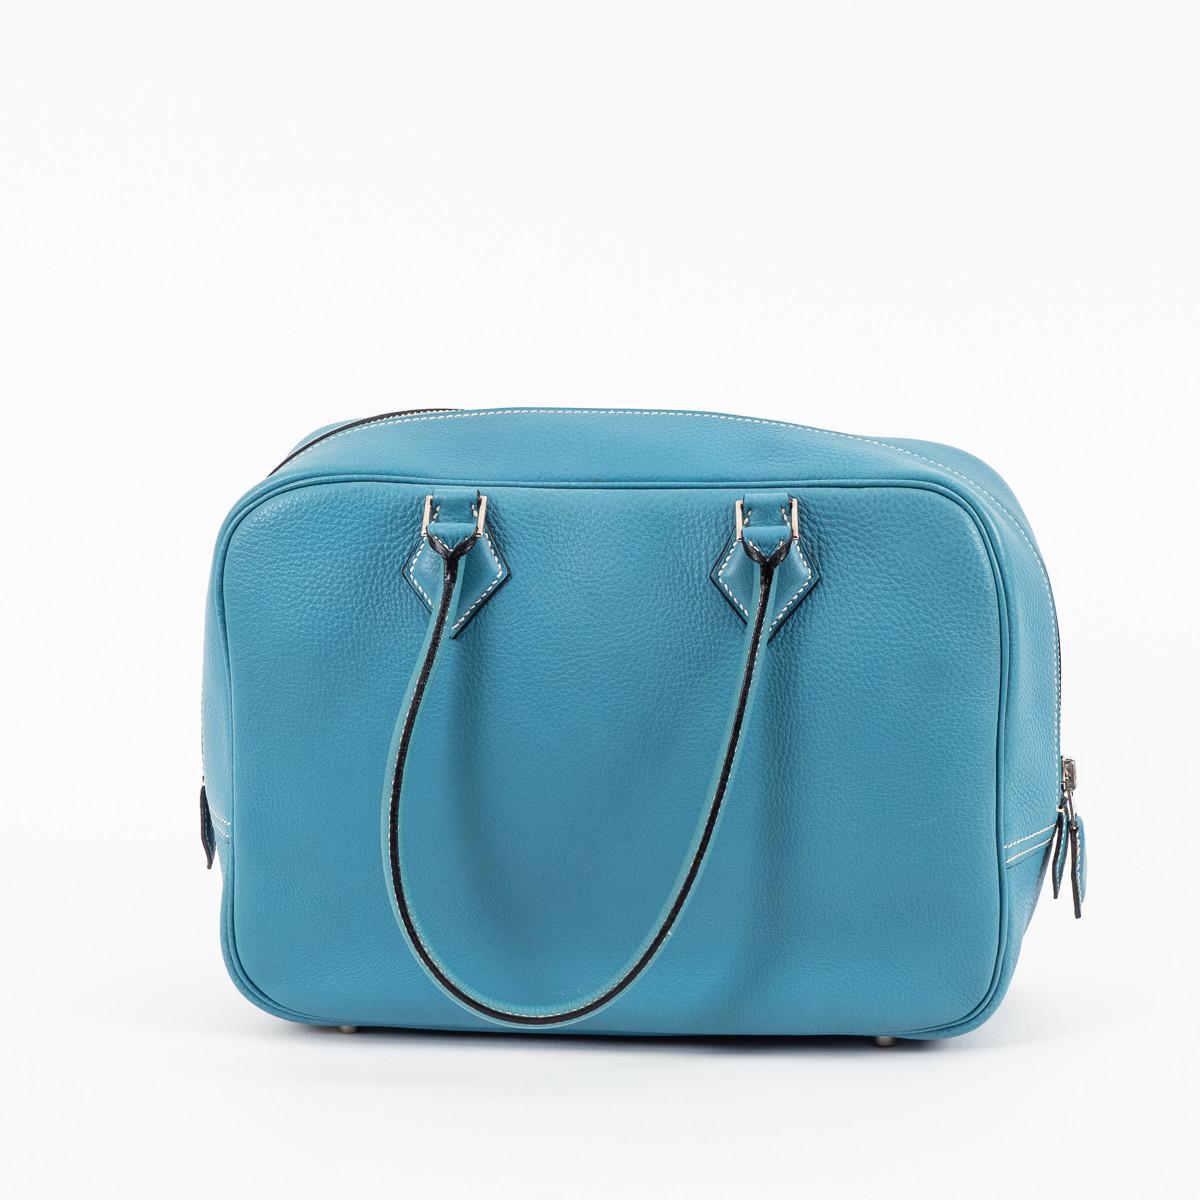 a9c3c965cc Hermès sac Plume moyen modèle cuir Epson bleu jean d'occasion.